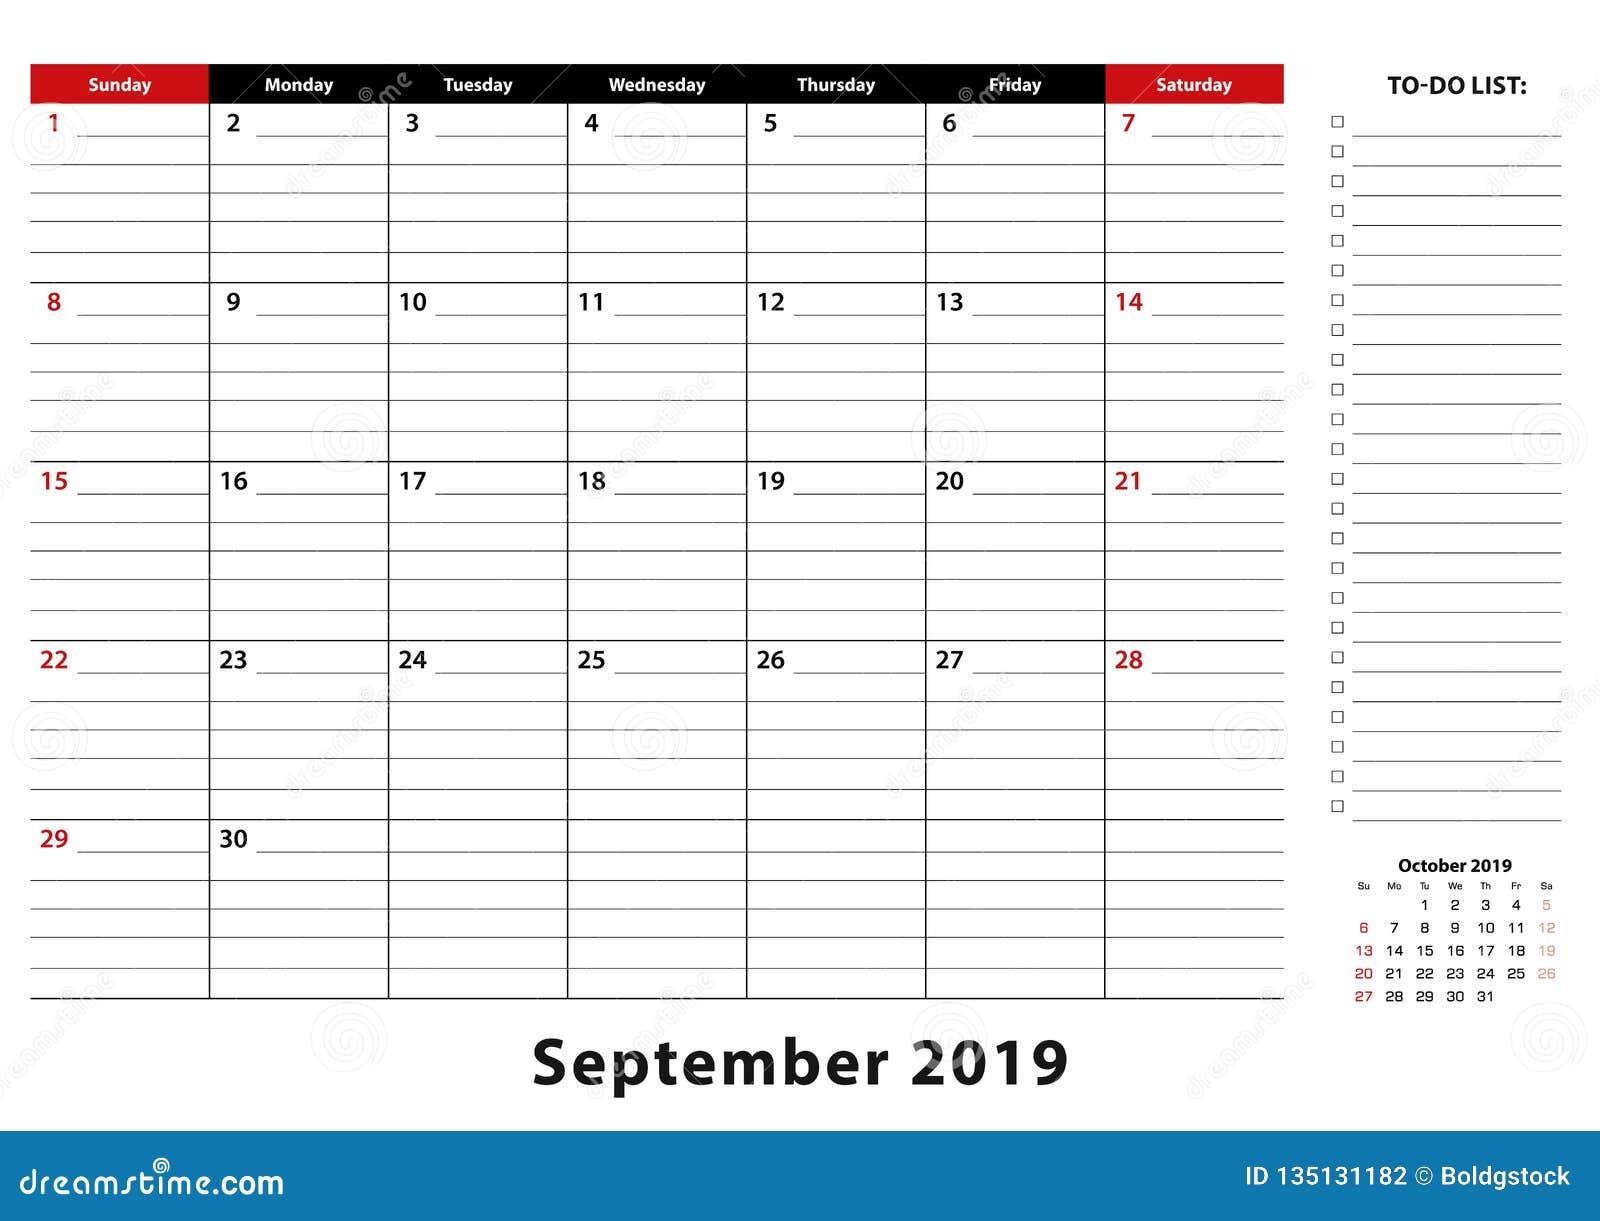 Calendar Week.September 2019 Monthly Desk Pad Calendar Week Starts From Sunday